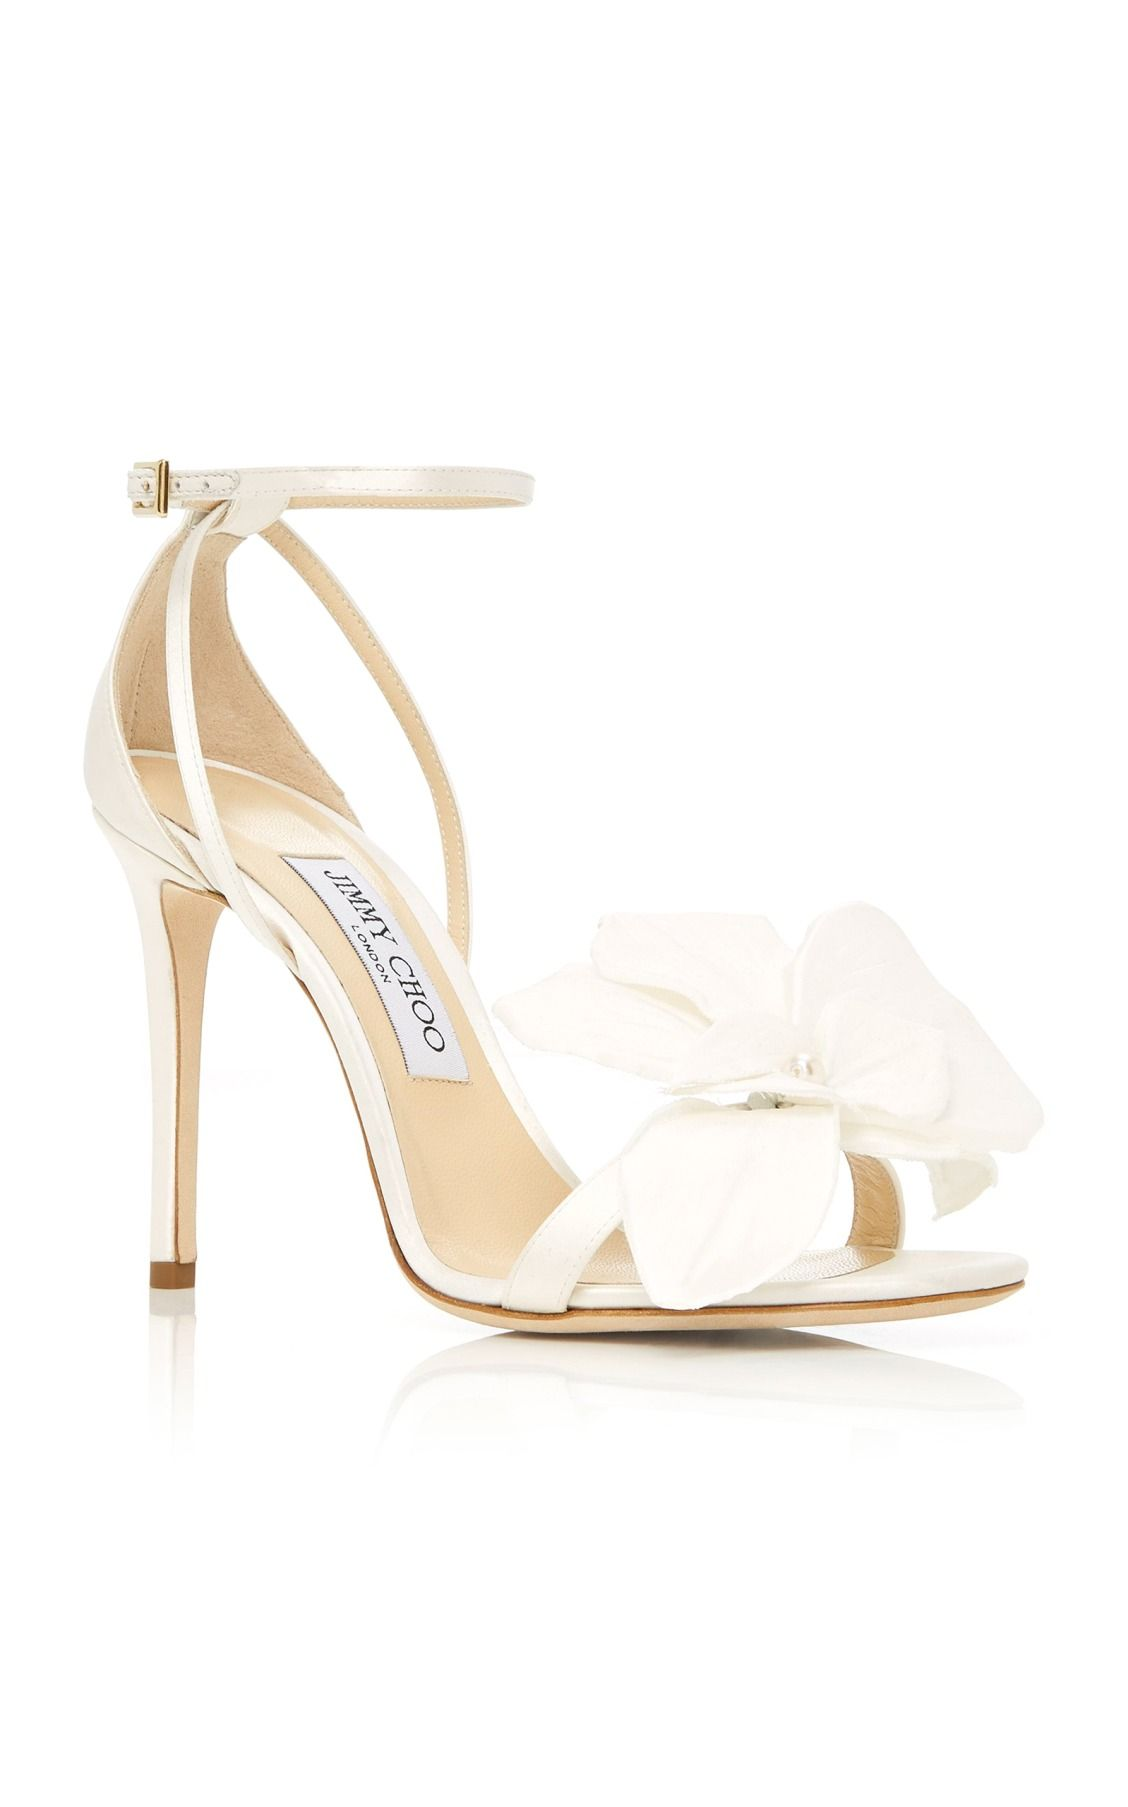 6112d4b2721 Aurelia Sandal by Jimmy Choo. Aurelia Sandal by Jimmy Choo Bridal Shoes